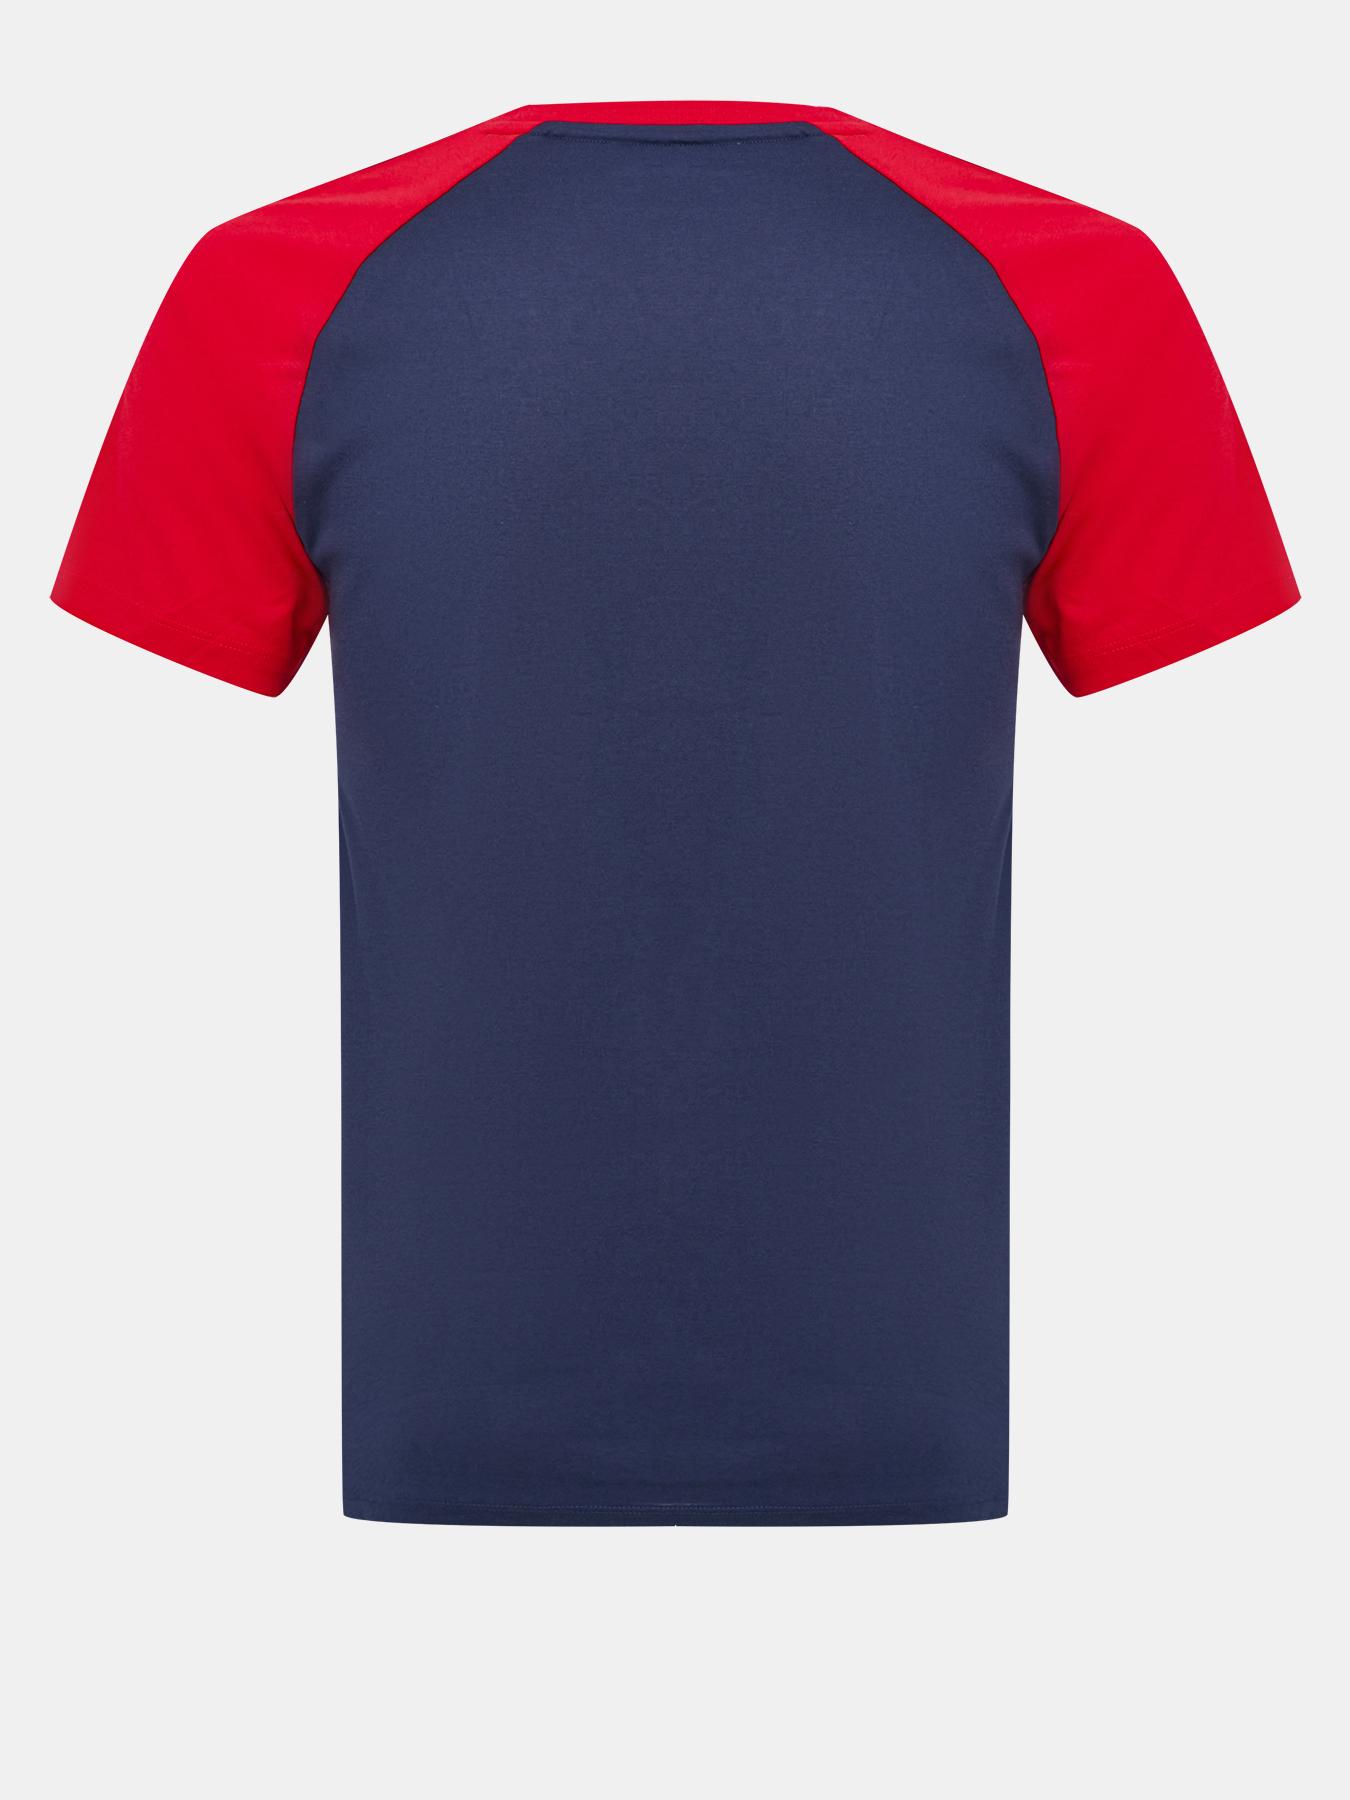 Фуфайка (футболка) Tommy Sport Футболка футболка tommy sport tommy sport to058ewfvxm5